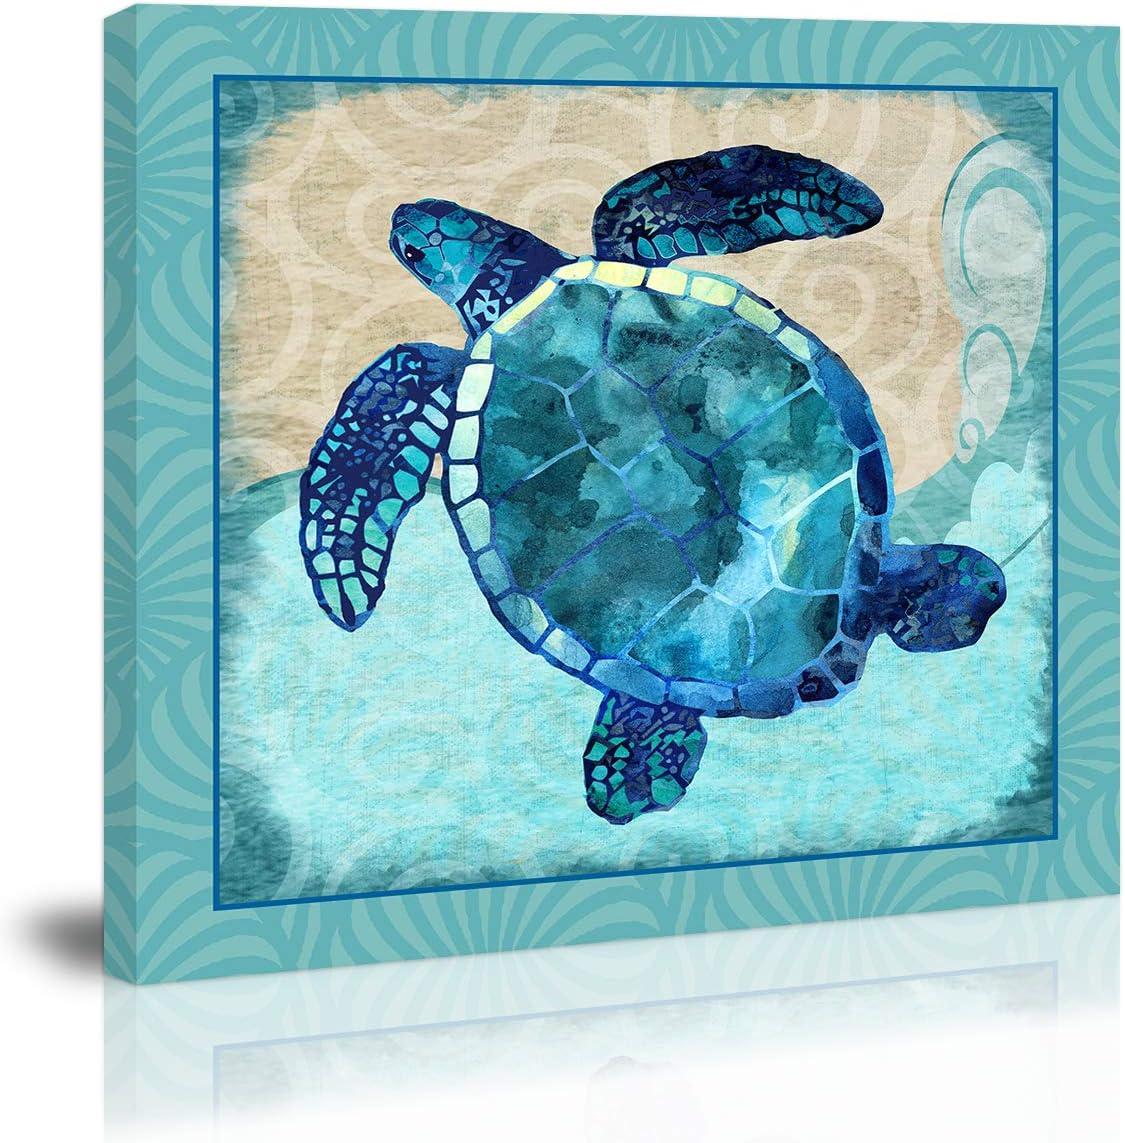 Blue Turtle Wall Art Soldering Decor Artwork Popular overseas Prints Modern Canvas Painting